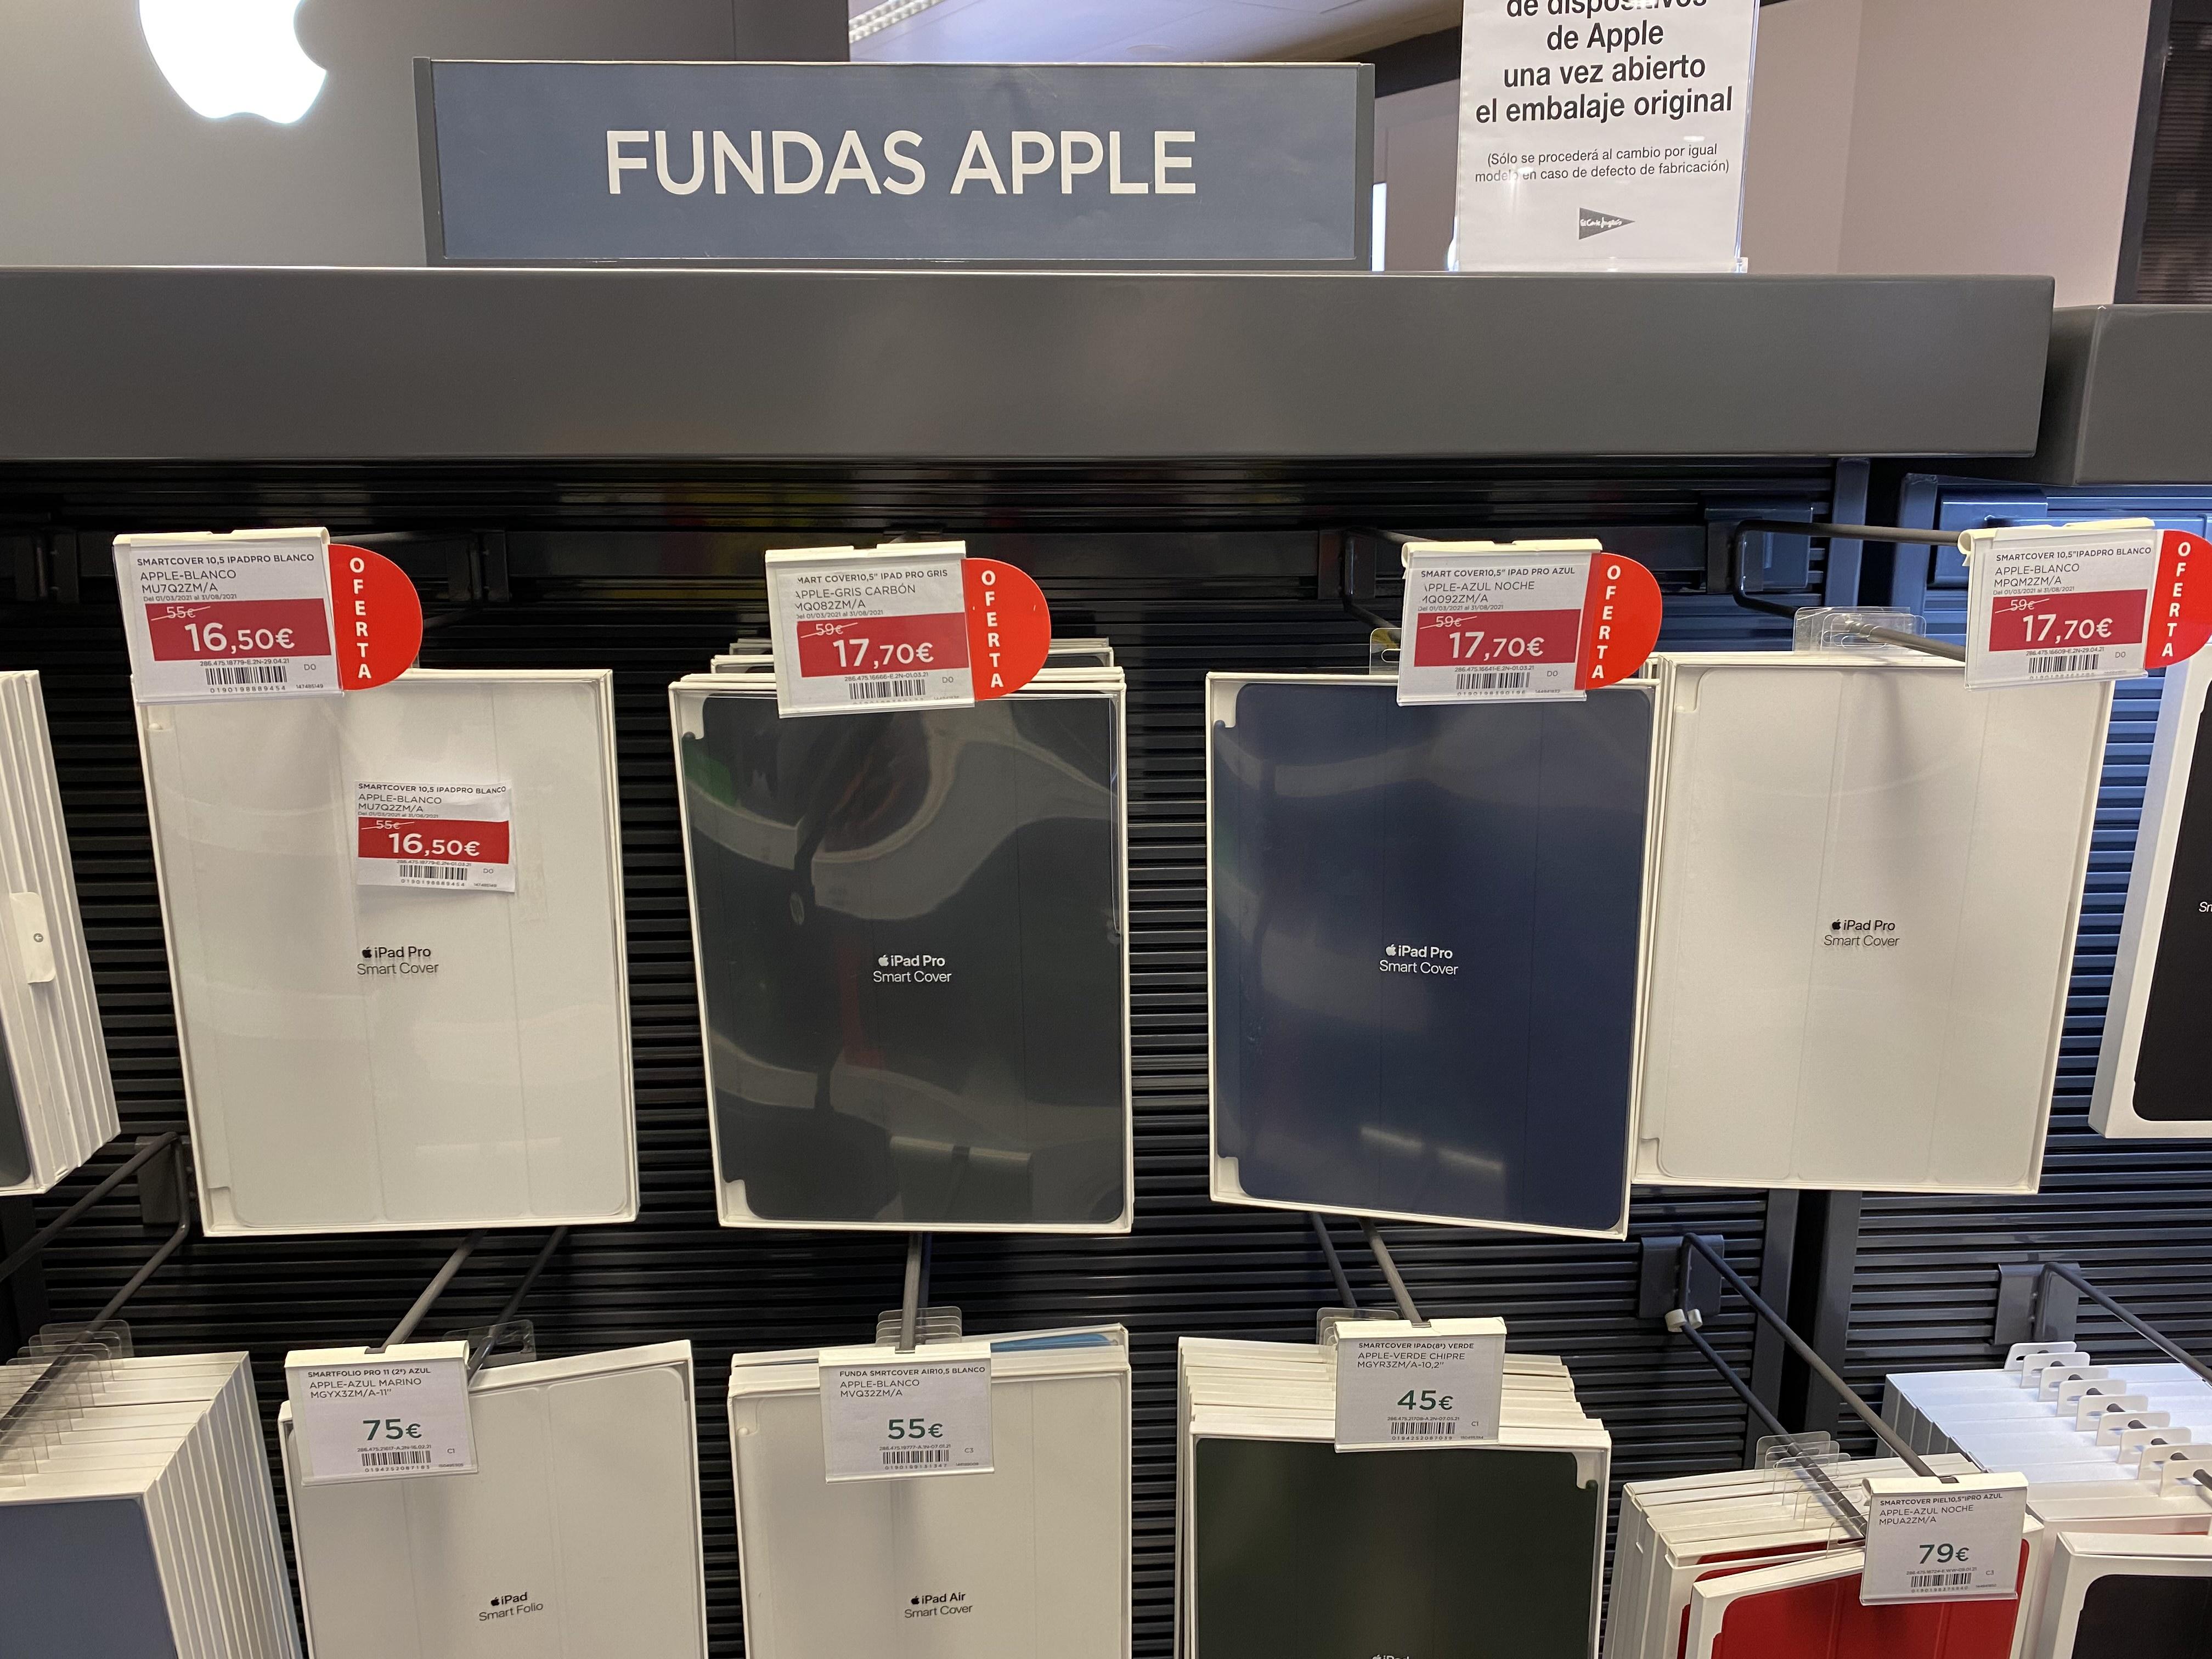 "Fundas Ipad Pro 10.5"" Original Apple"